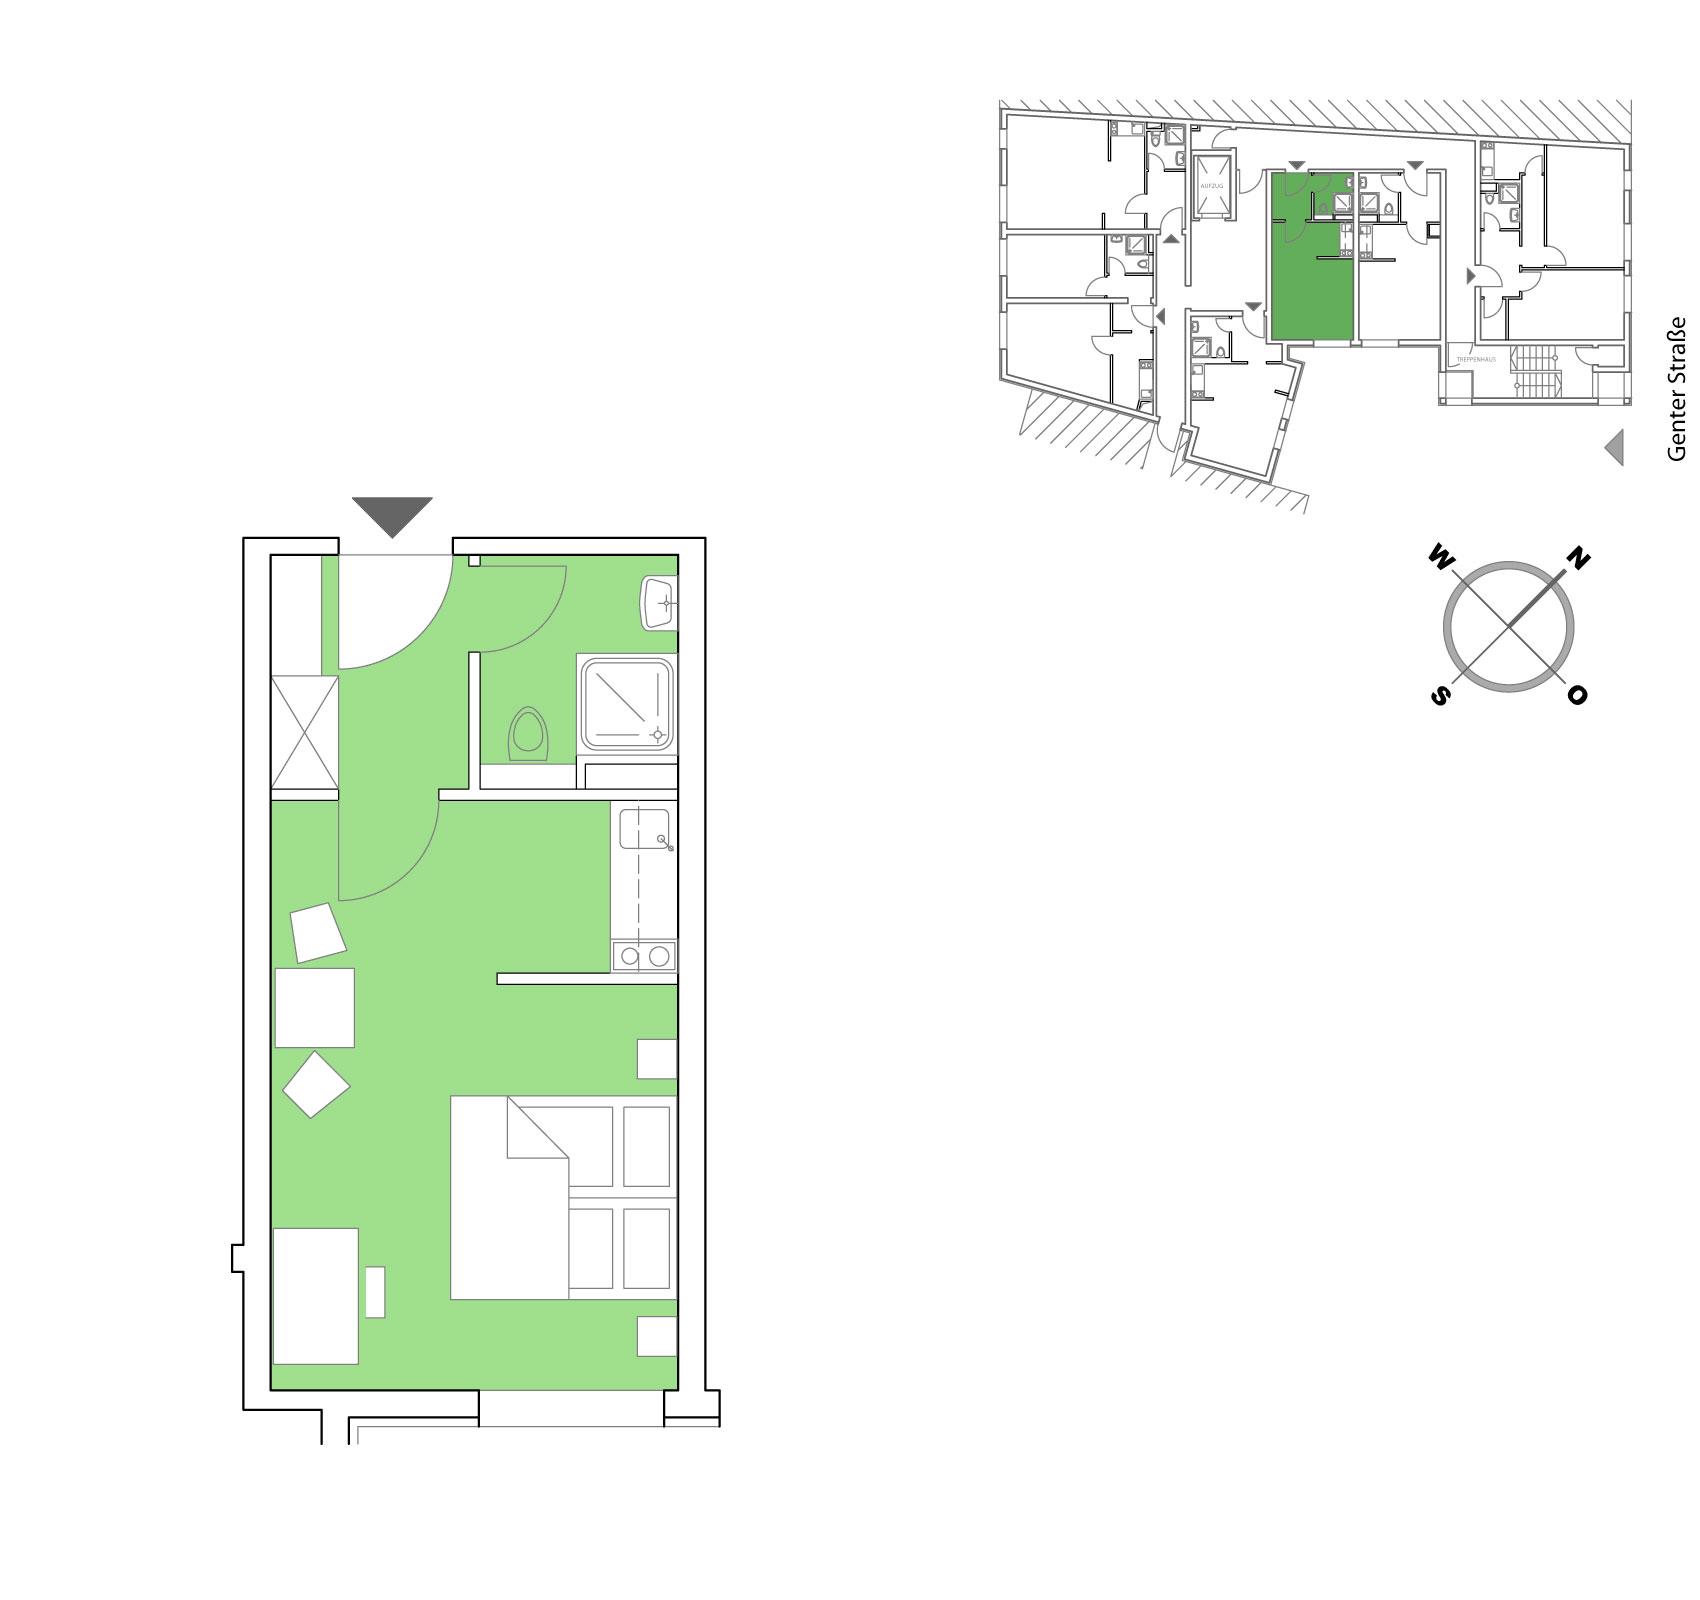 Grundriss Möblierte Apartments in Berlin 25,50 m²